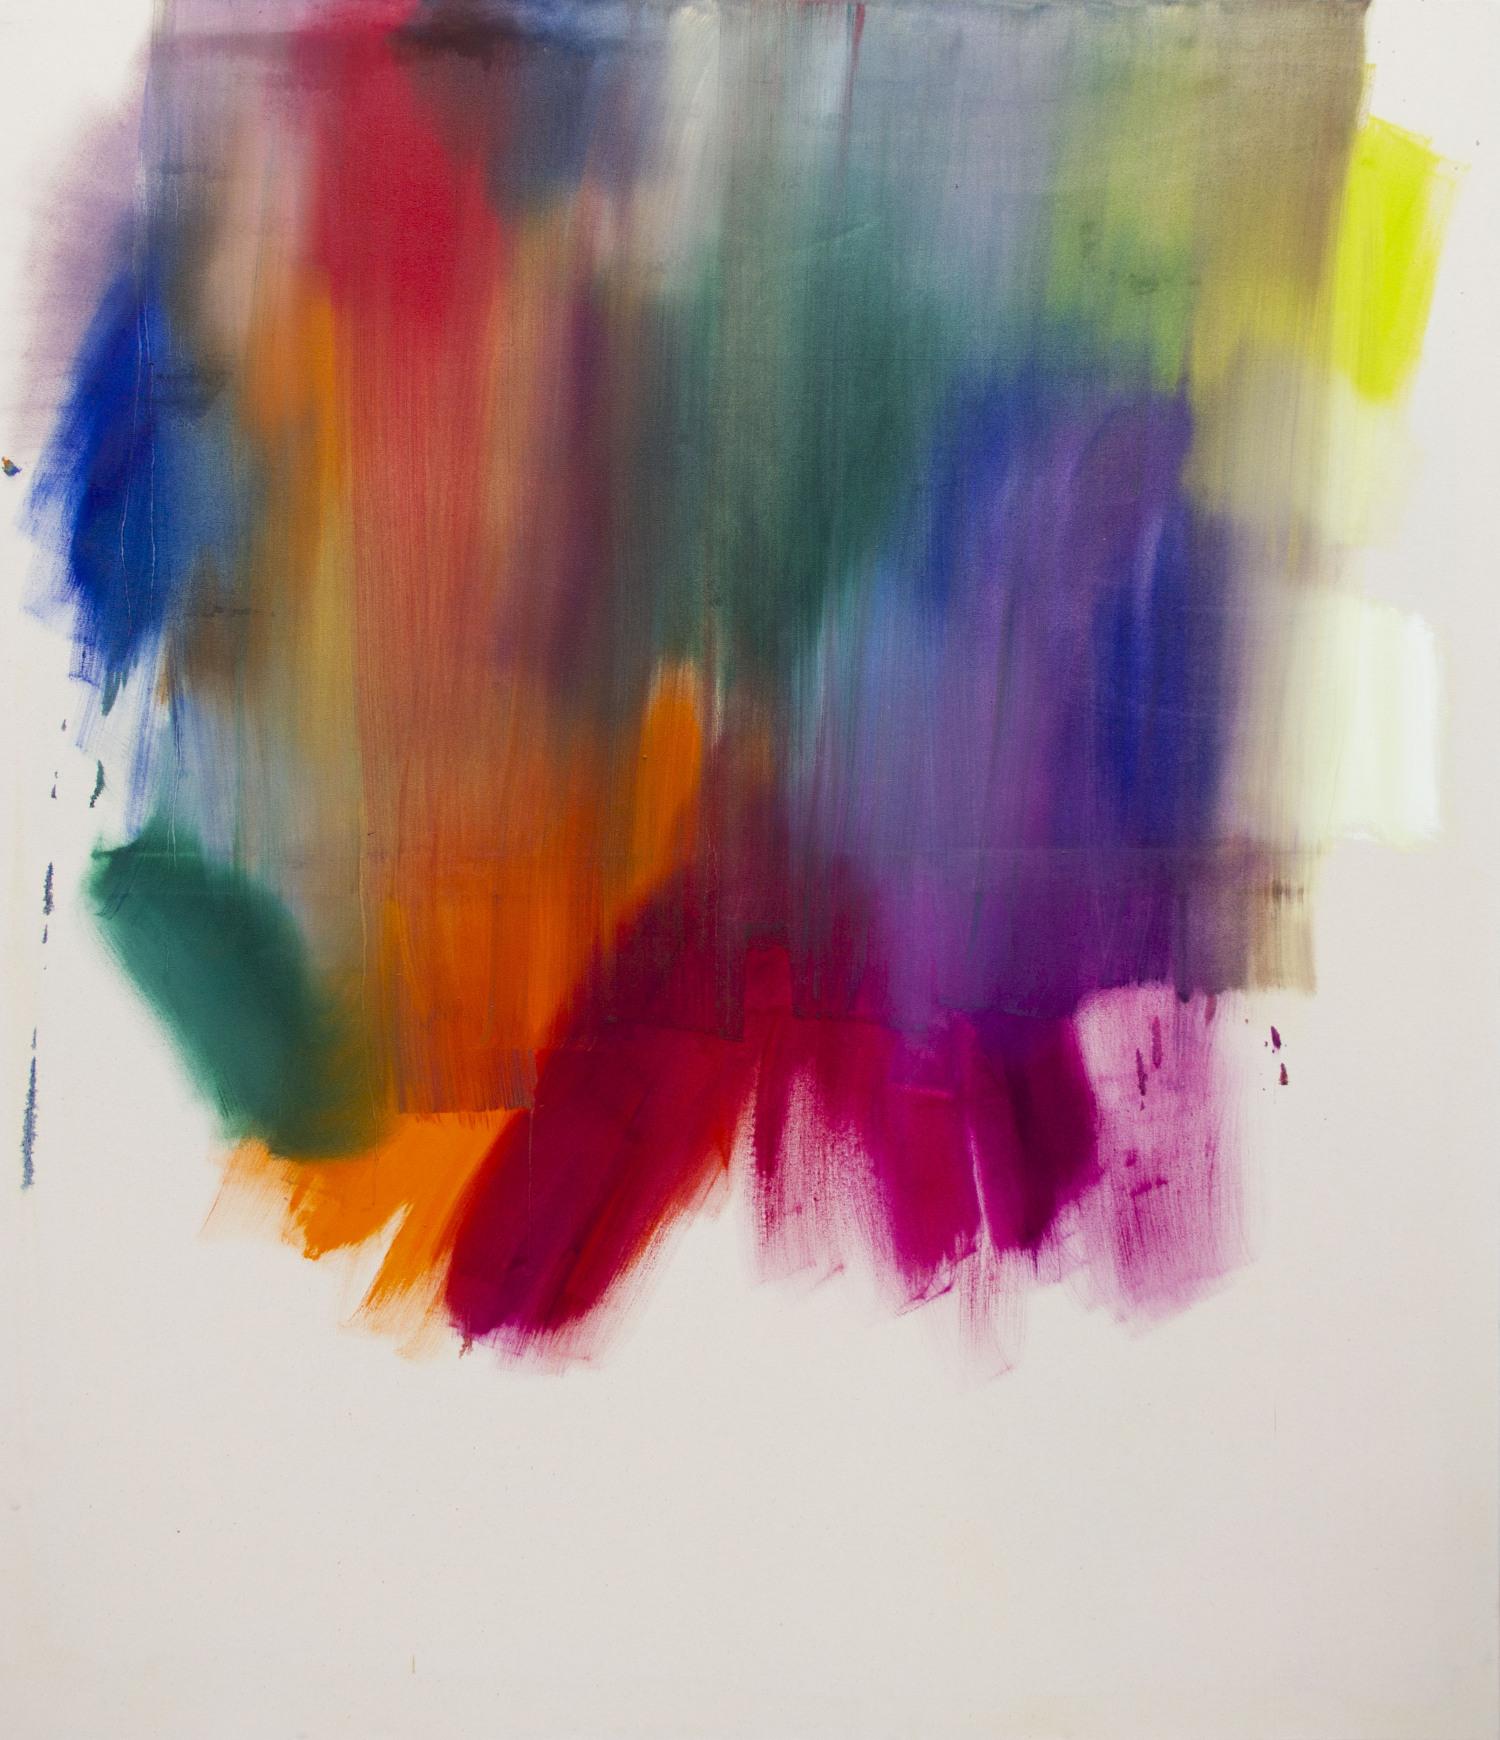 2 © Charlotte Hilbolt, untitled, 2019, oil on canvas, 155x180cm, Charlotte Hilbolt